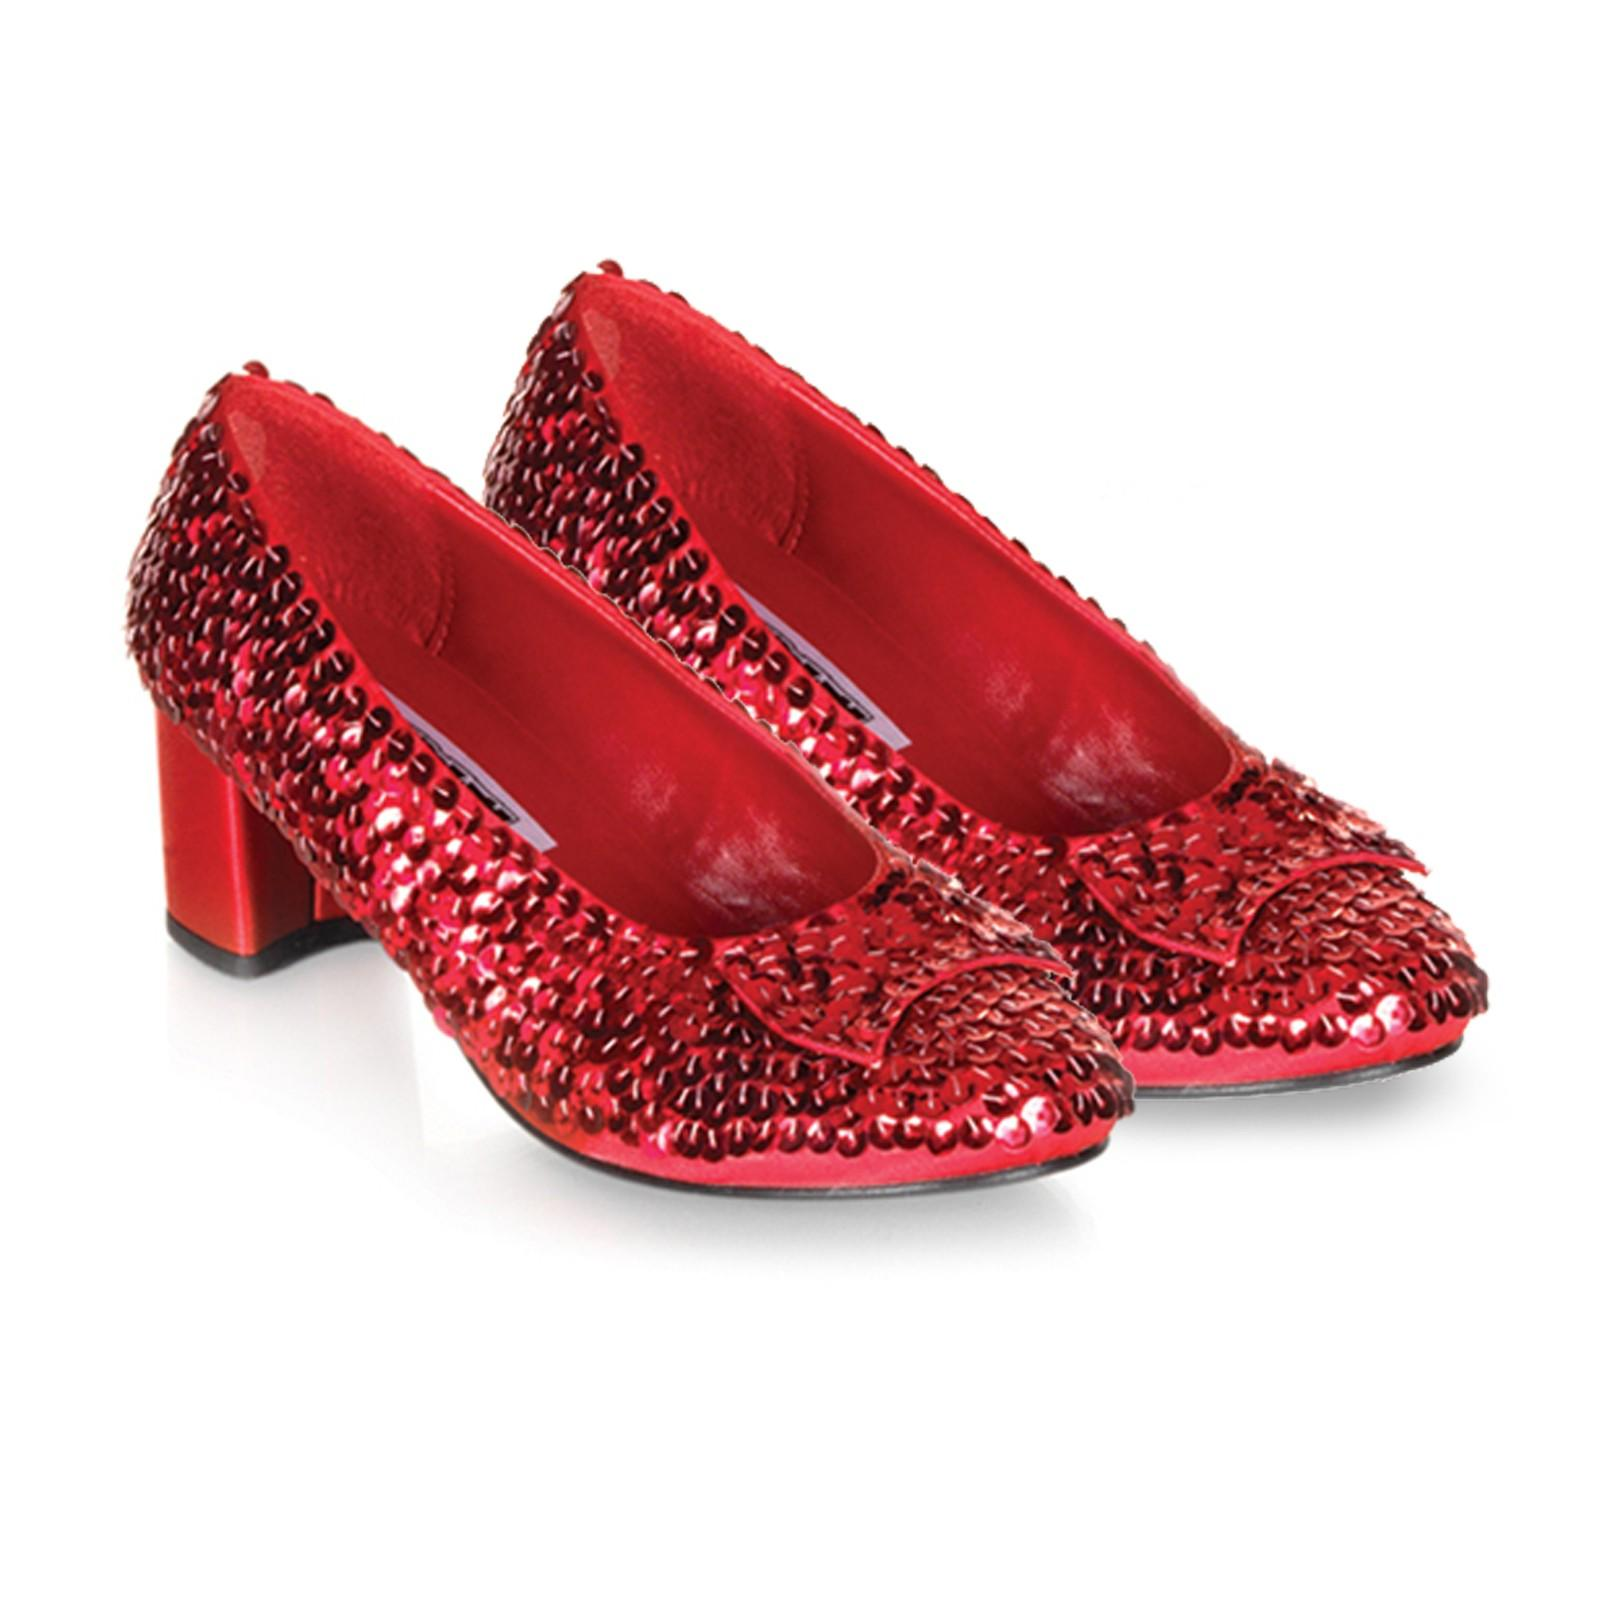 06a4226c7b8a Dorothy Red Sequin Girls  Shoes - Walmart.com